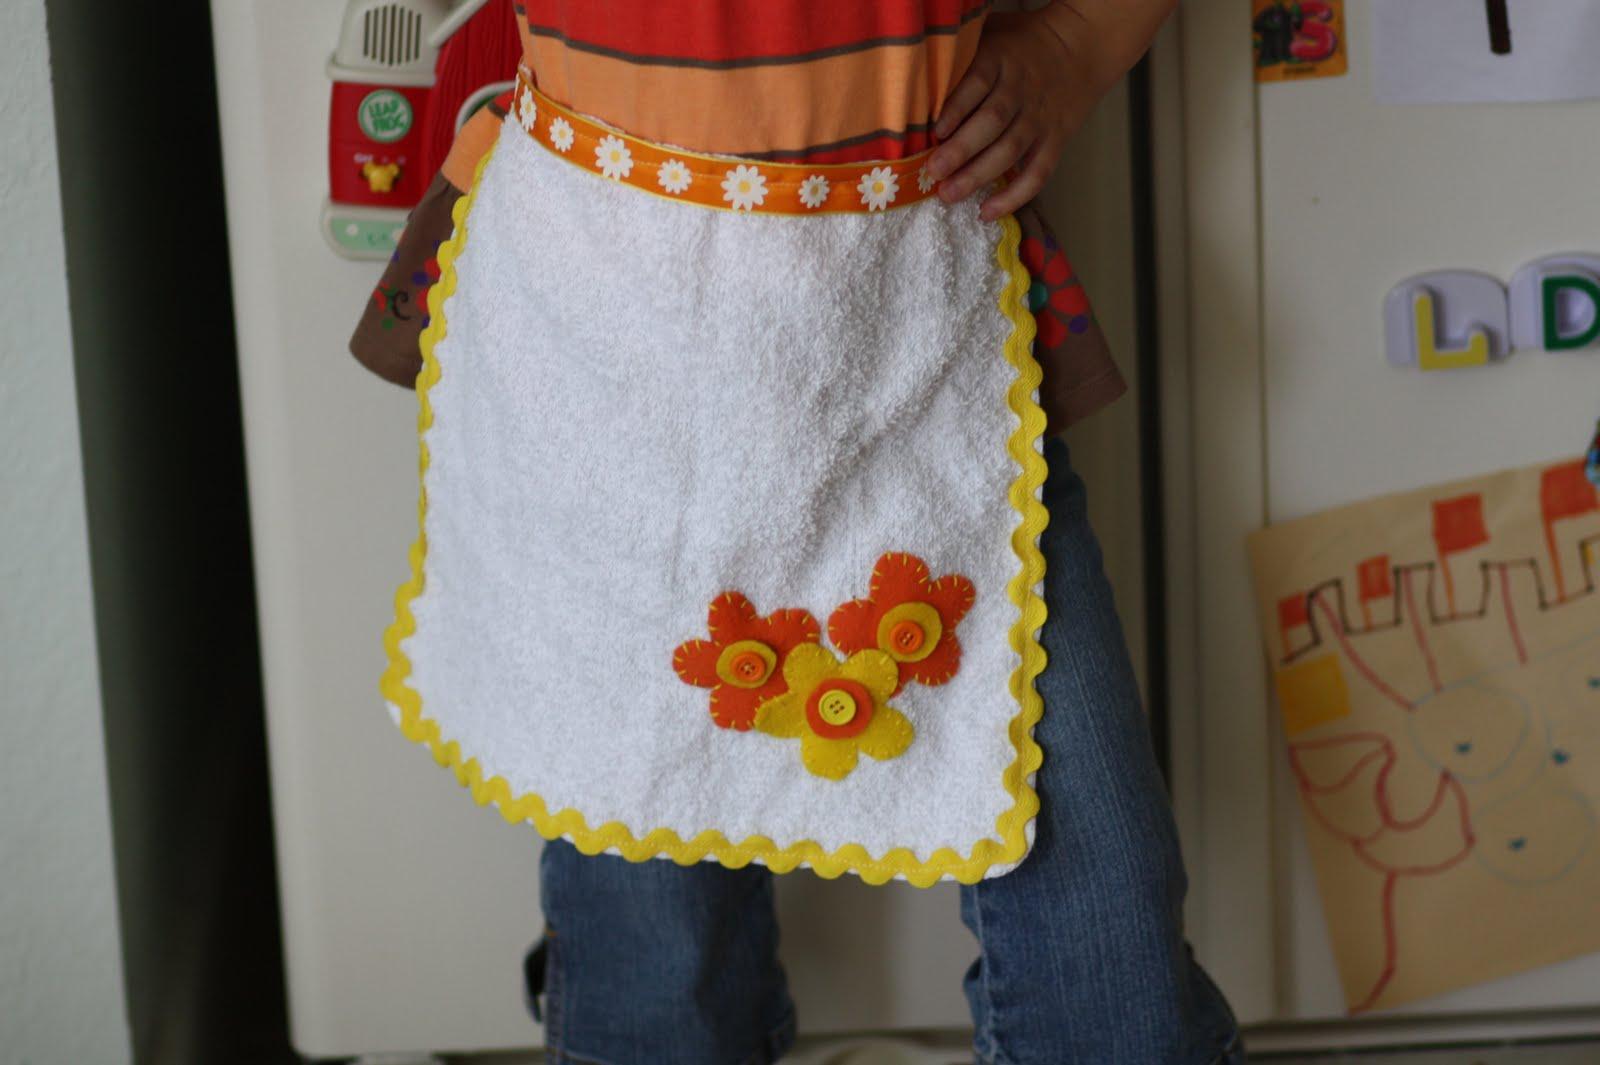 http://1.bp.blogspot.com/_eq9w-Zrcr7Y/TP4mcFtYIHI/AAAAAAAABZE/BMAkMOrXK_g/s1600/Kids+Washcloth+Apron+H.JPG